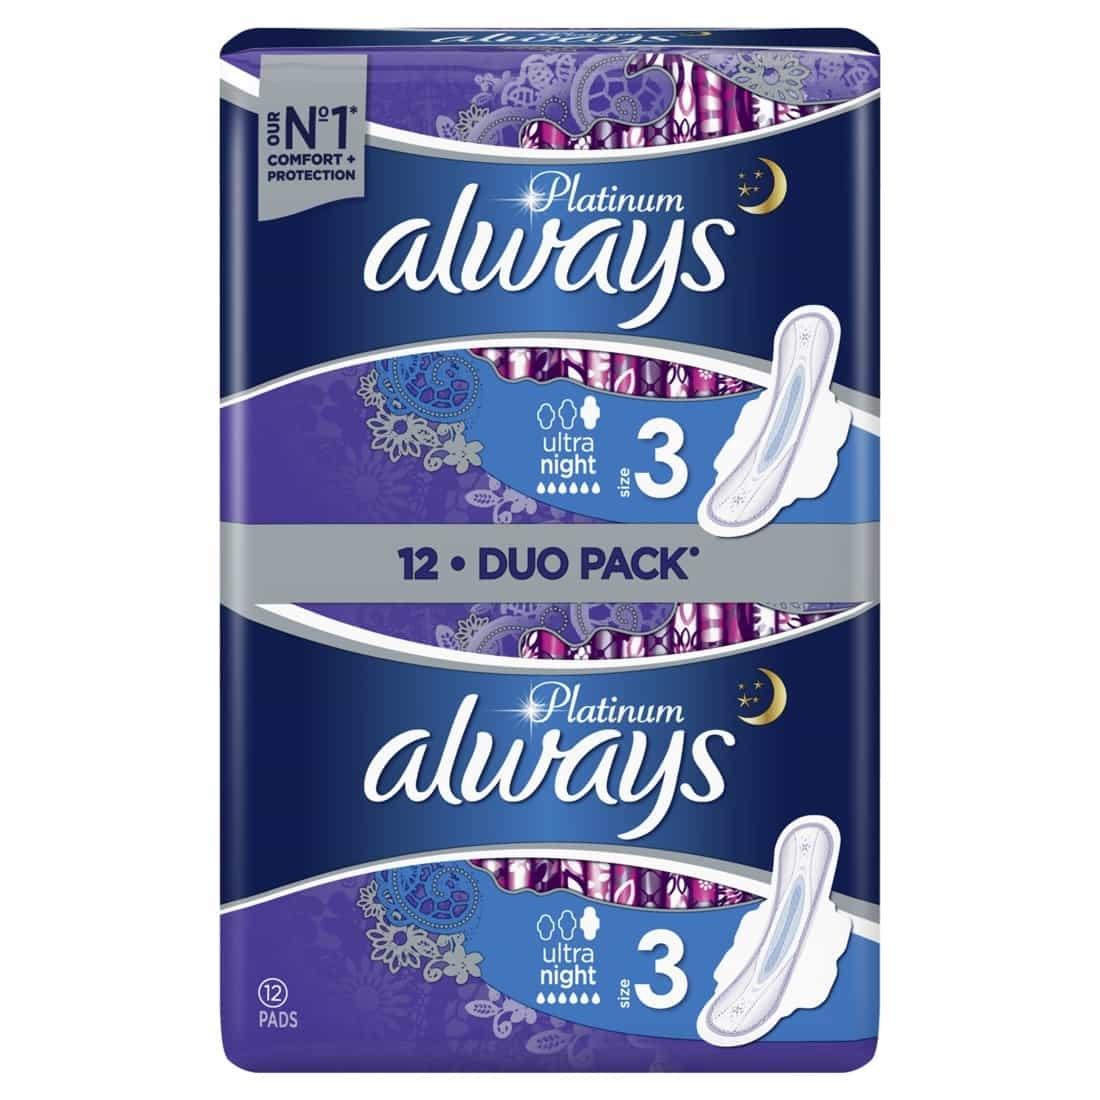 ALWAYS Platinum Ultra Night Σερβιέτες με Φτερά Μέγεθος 3 6+6 τμχ 1+1 ΔΩΡΟ